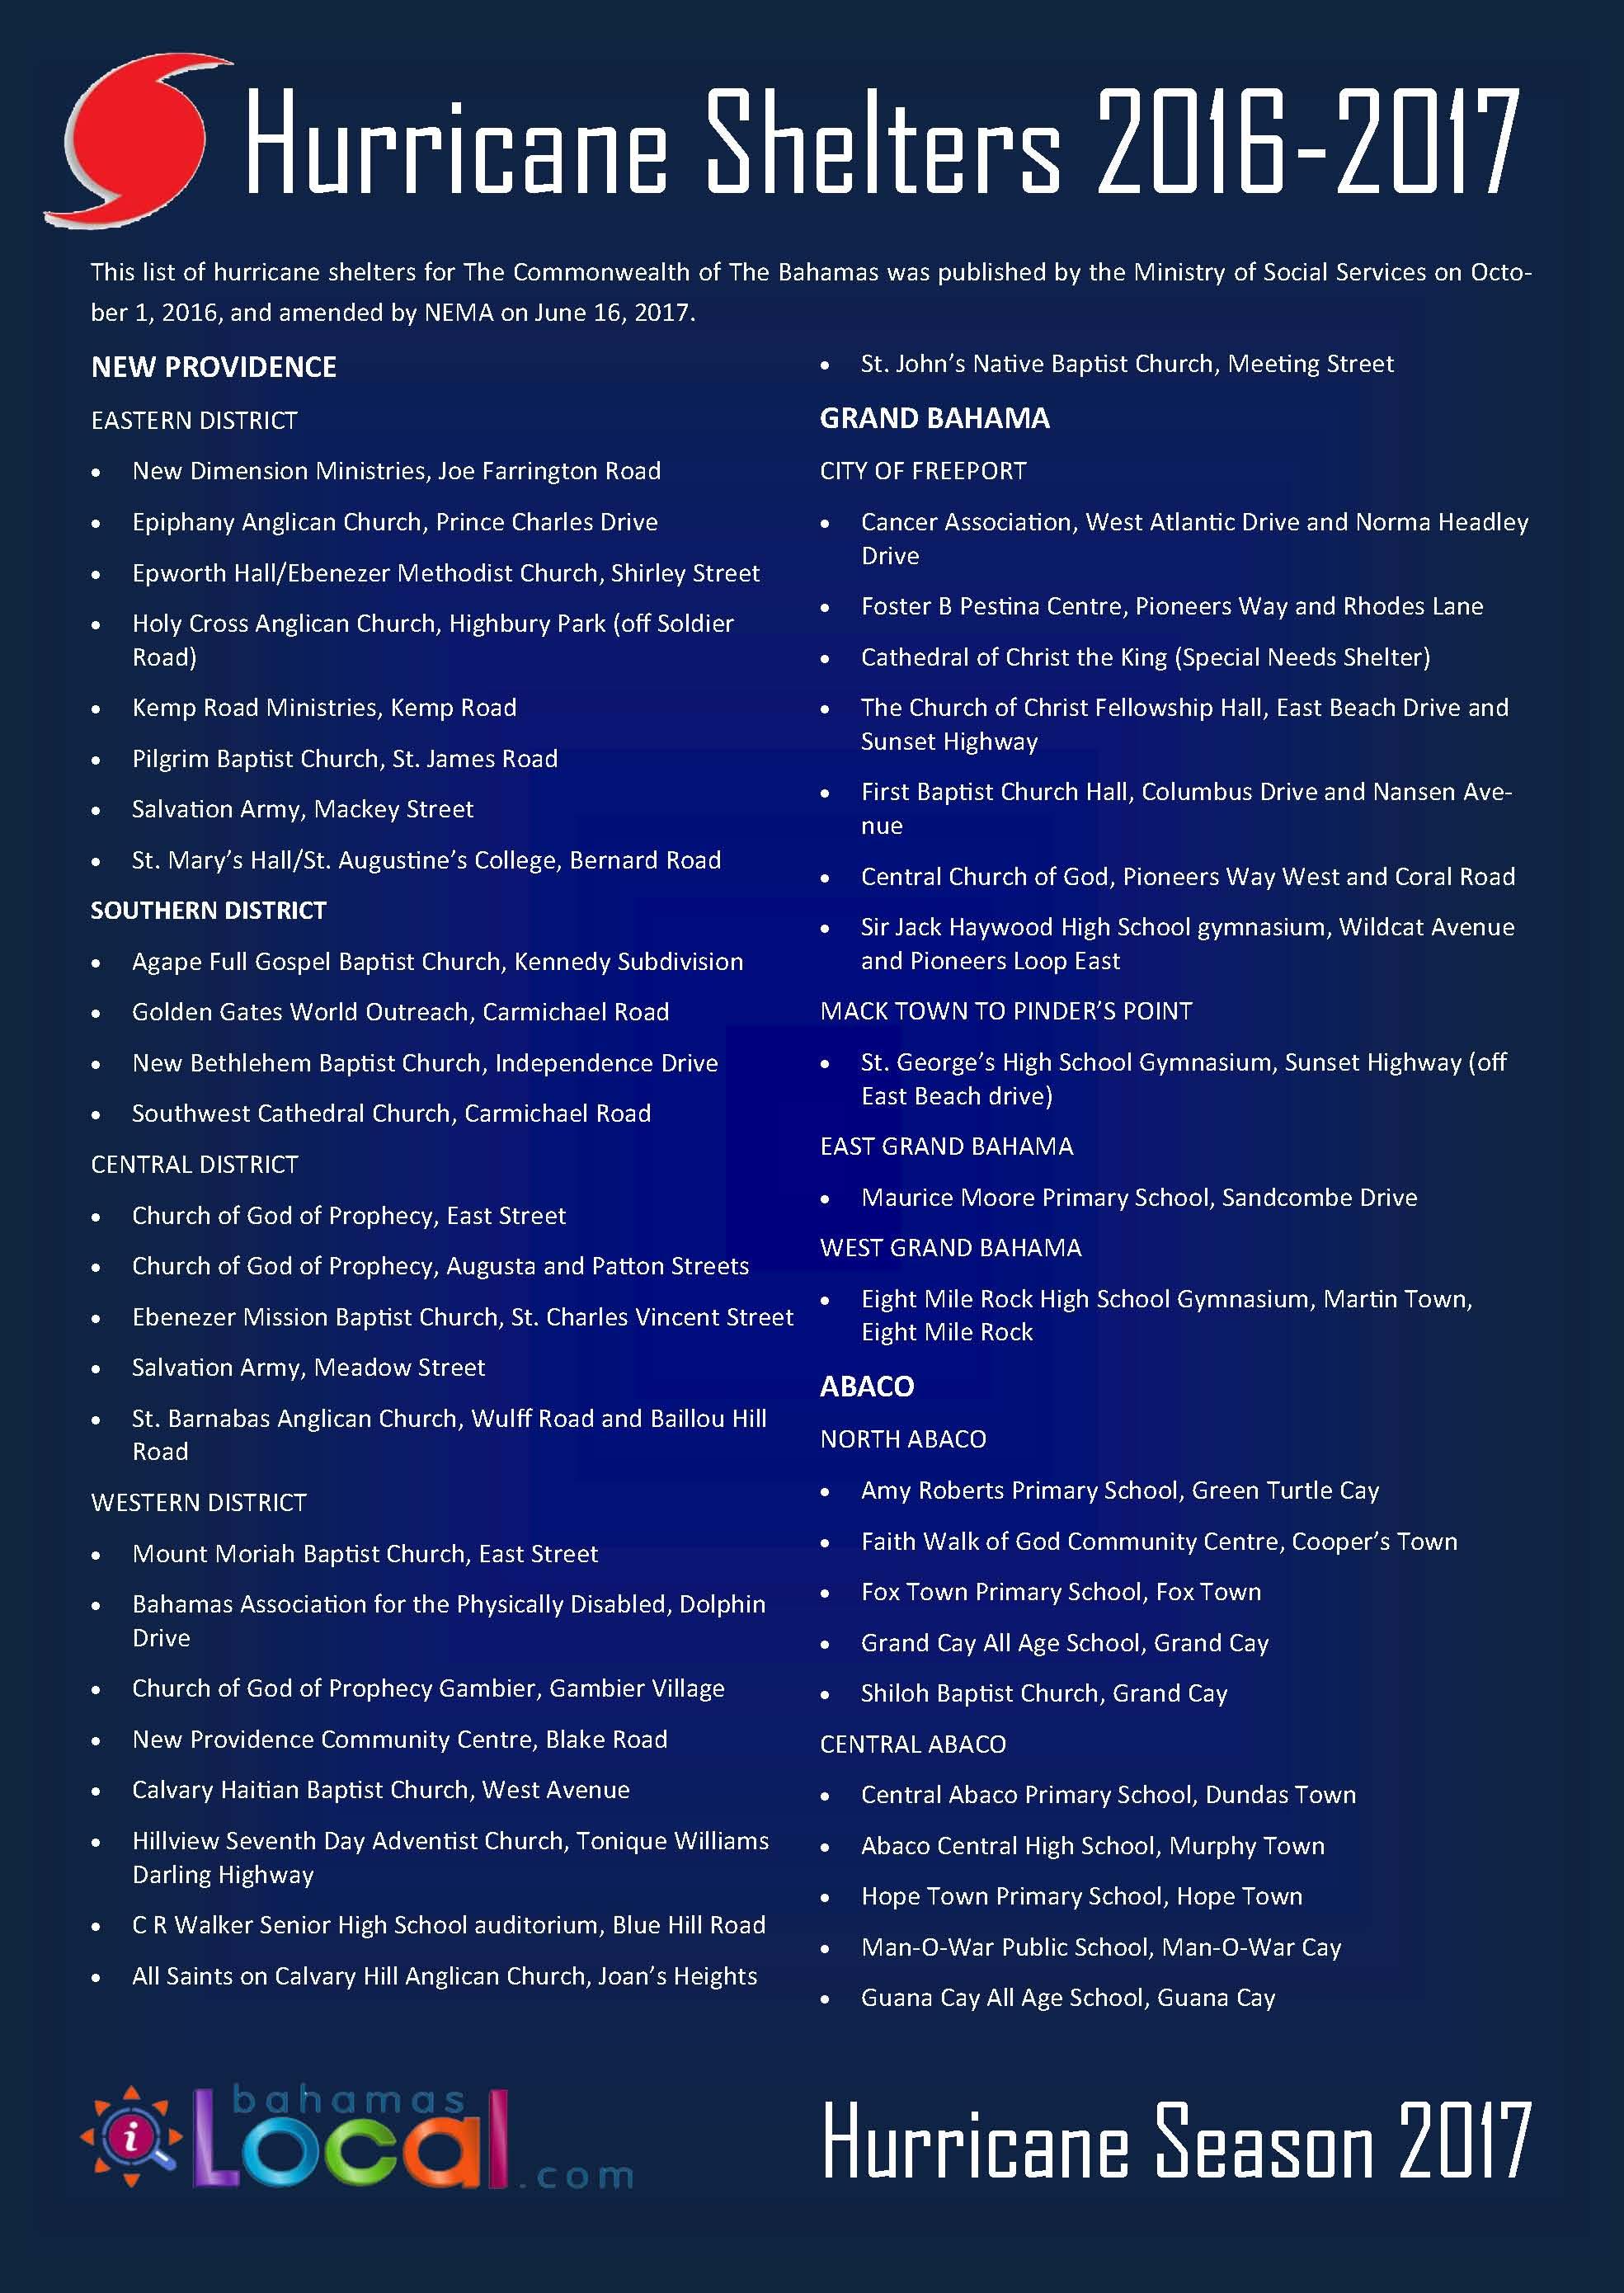 Shelters Page 1 | Hurricane Season 2017